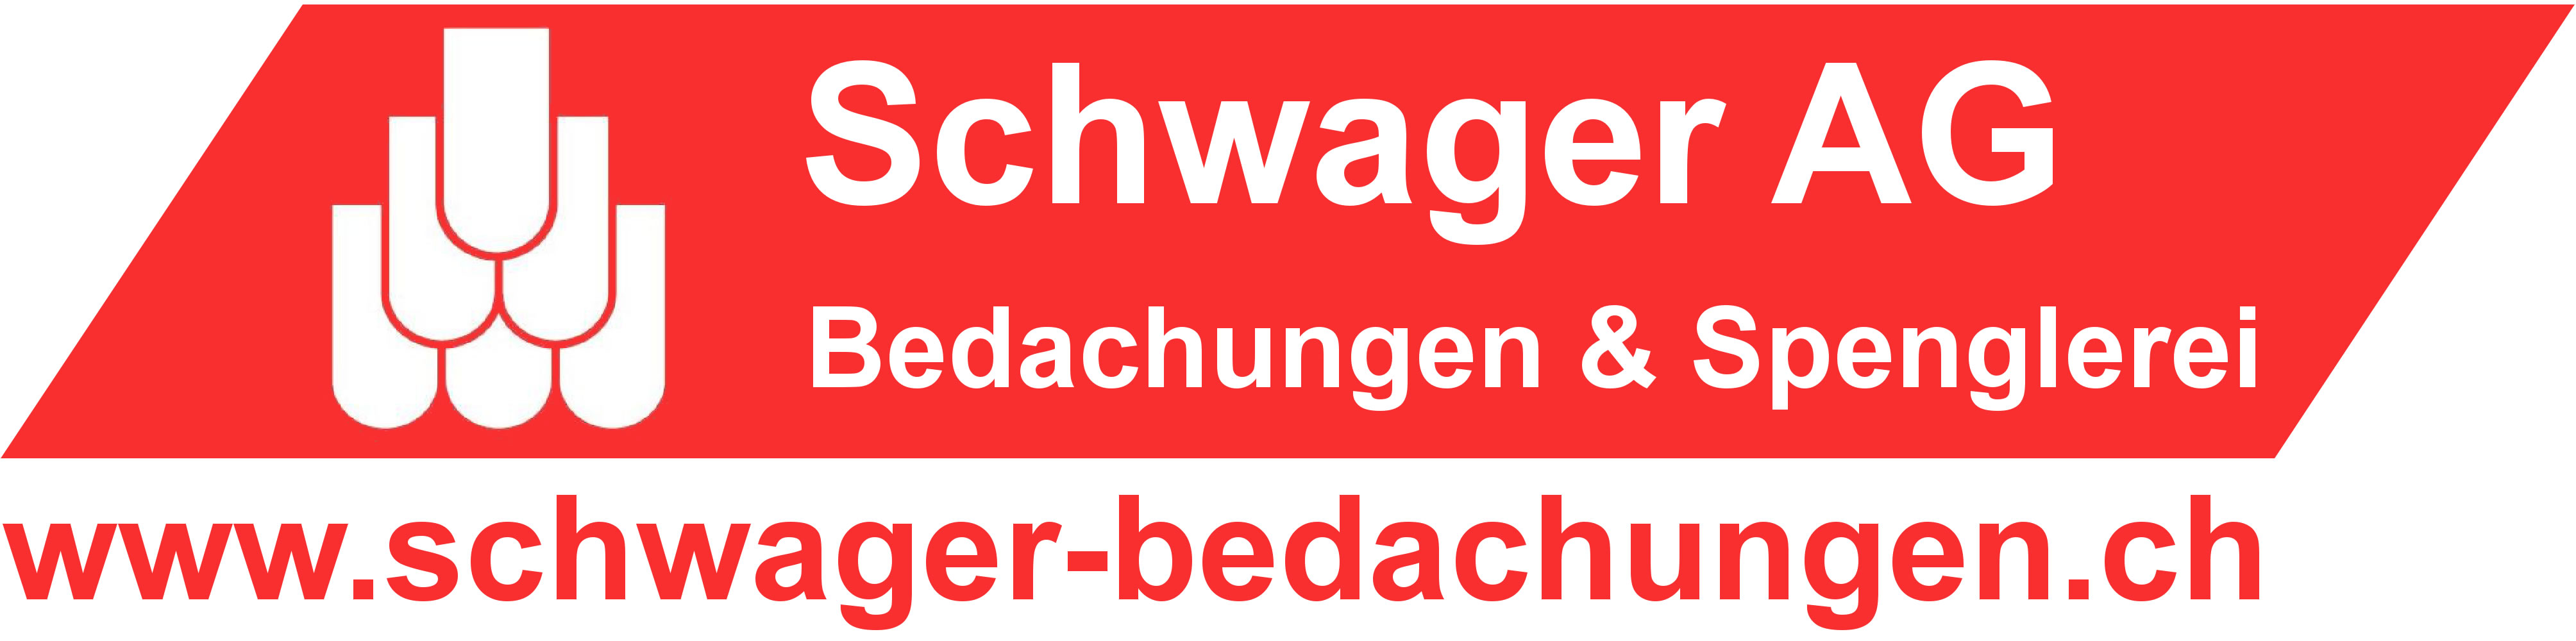 Schwager AG